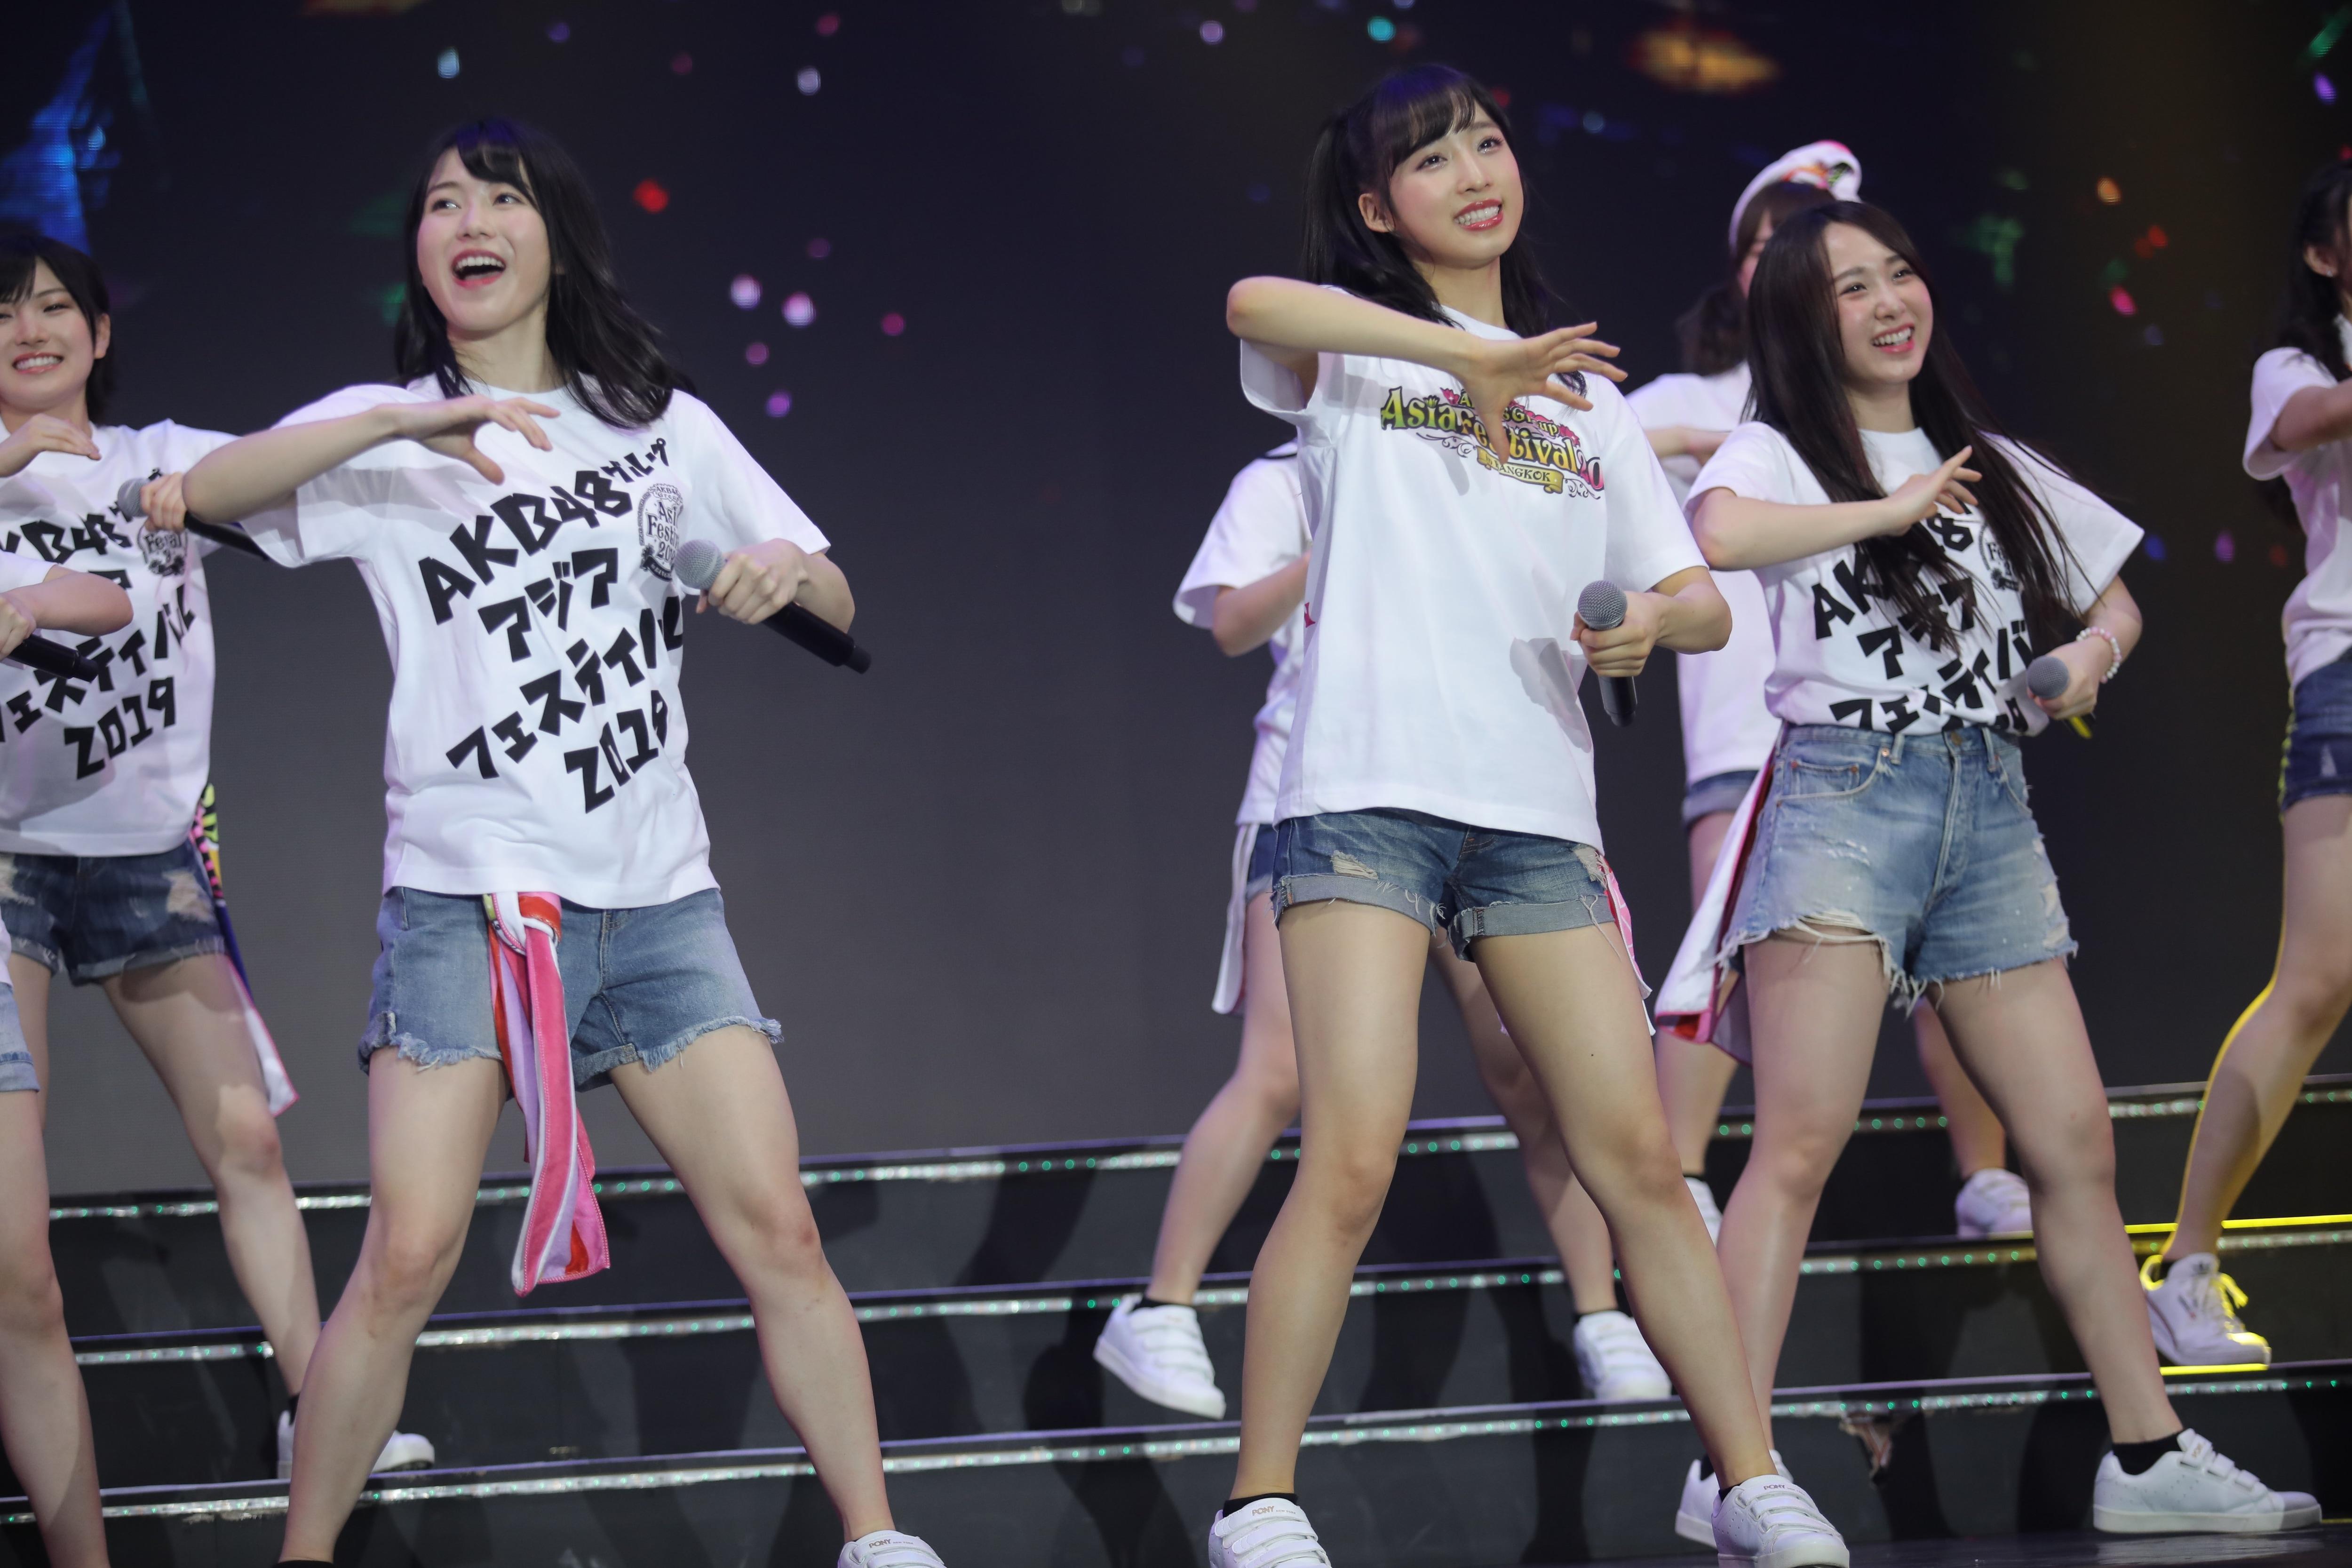 AKB48ほか、海外の姉妹グループが集結し『恋するフォーチュンクッキー』を熱唱!【写真23枚】の画像020